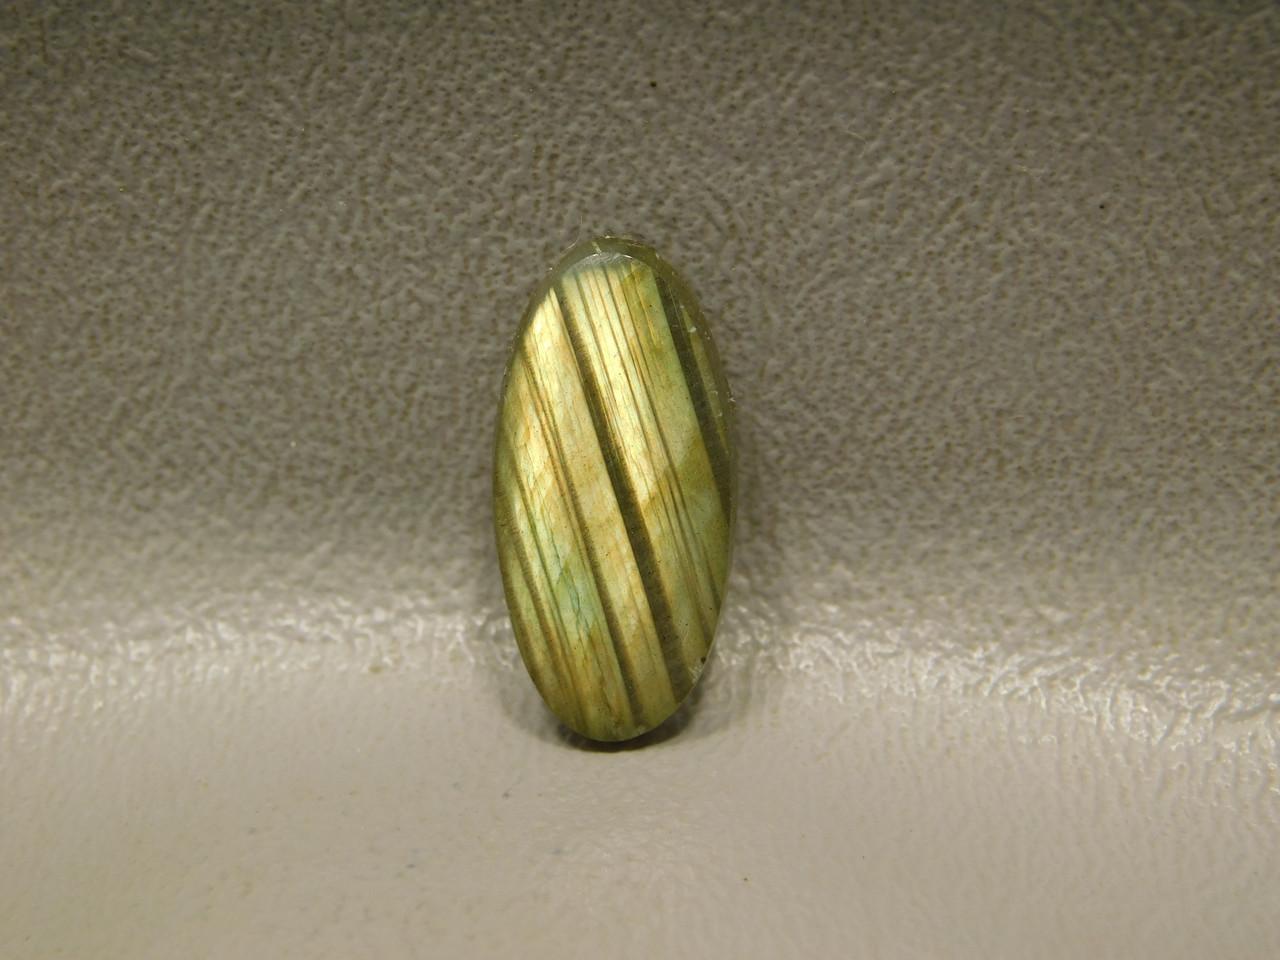 Rainbow Labradorite Cabochon Small Jewelry Ring Stone #19